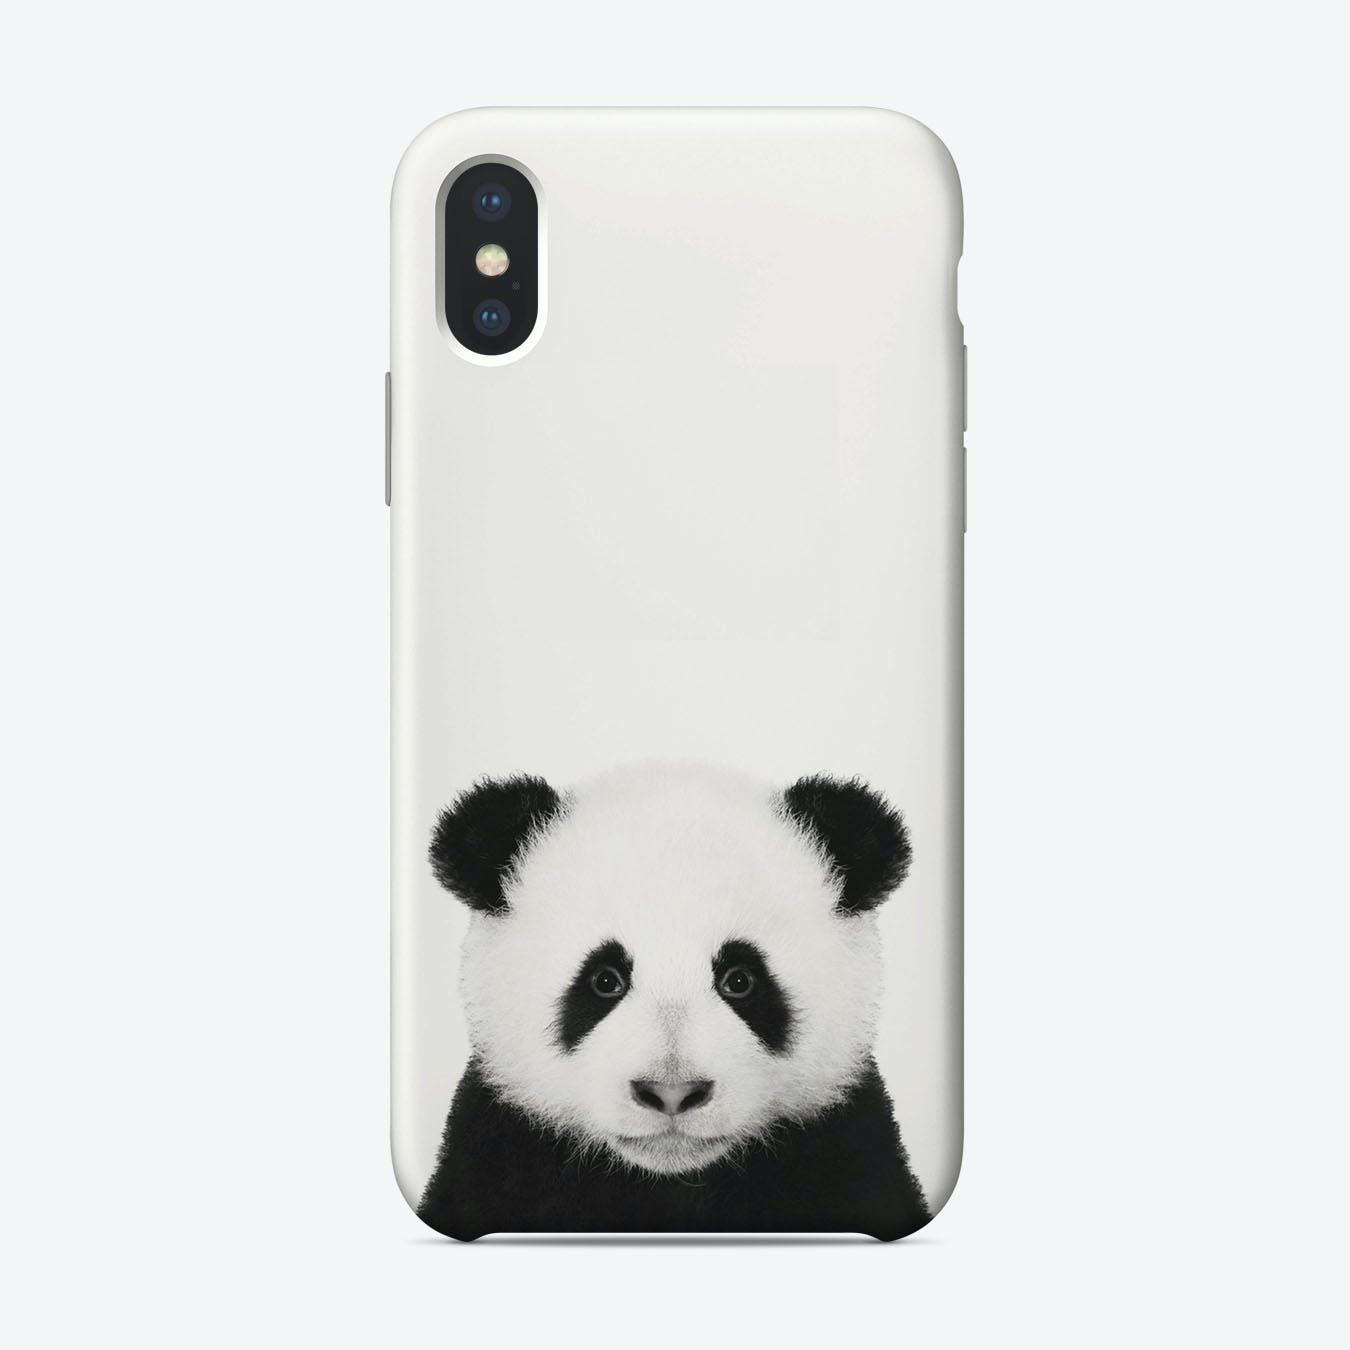 Panda B&W iPhone Case